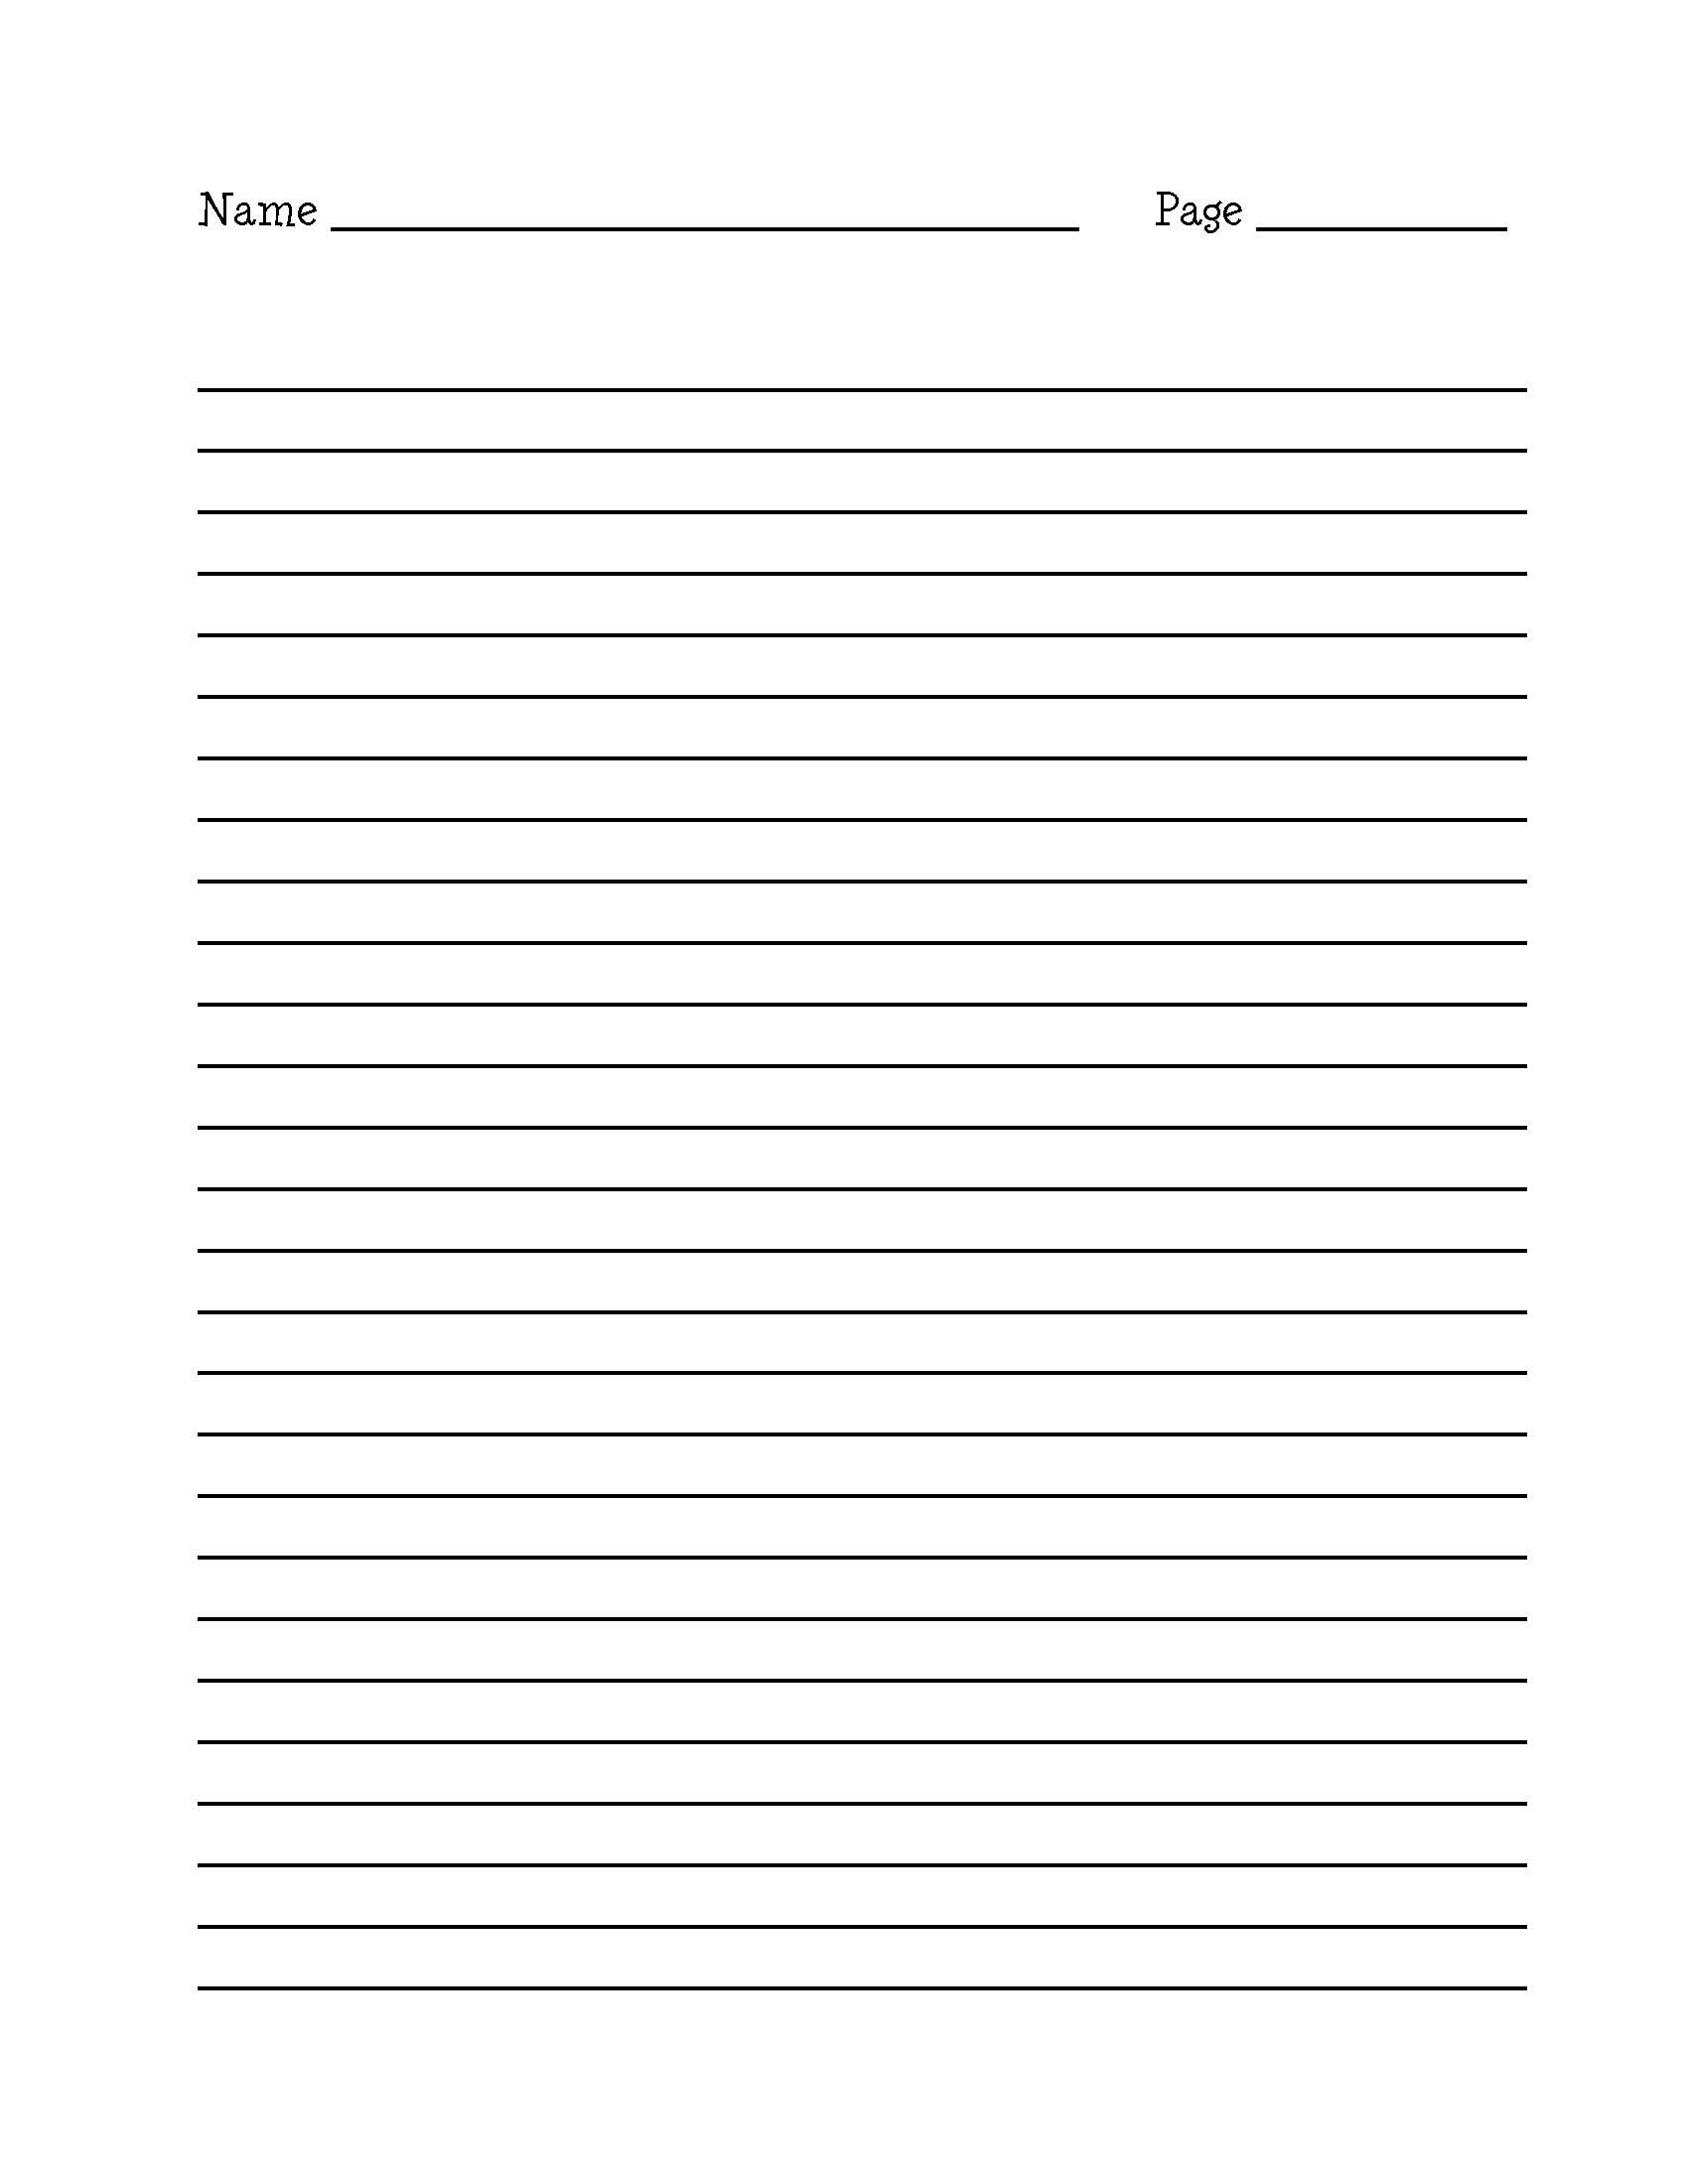 Printable Lined Writing Paper Pdf   Corner Of Chart And Menu - Free Printable Lined Writing Paper